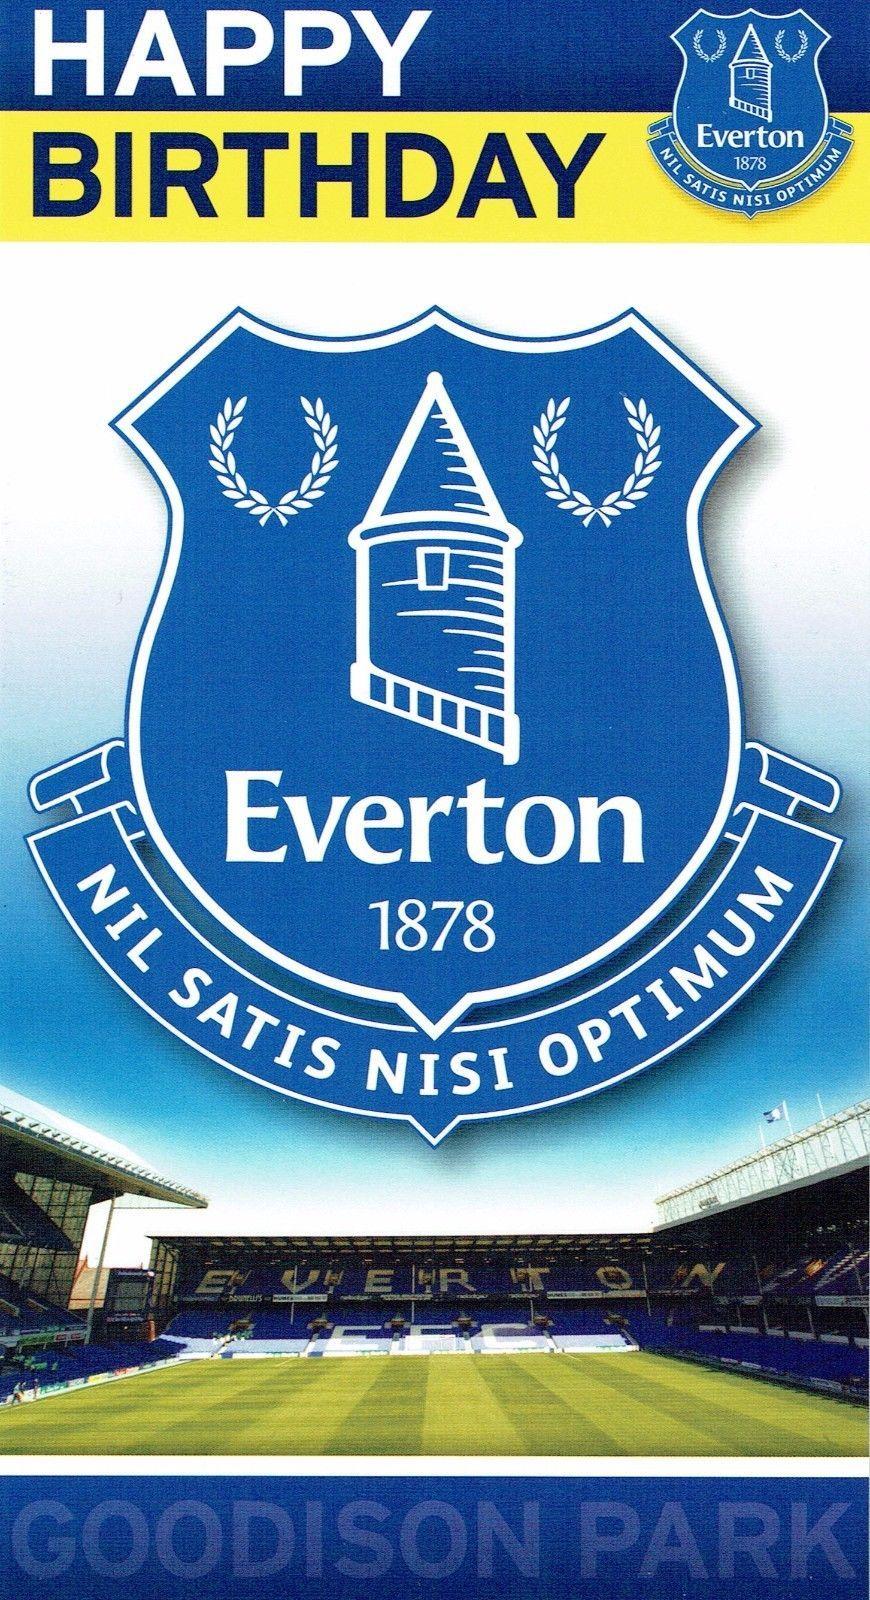 Official Everton Football Club Birthday Card Or Gift Wrap Everton Football Club Everton Birthday Cards